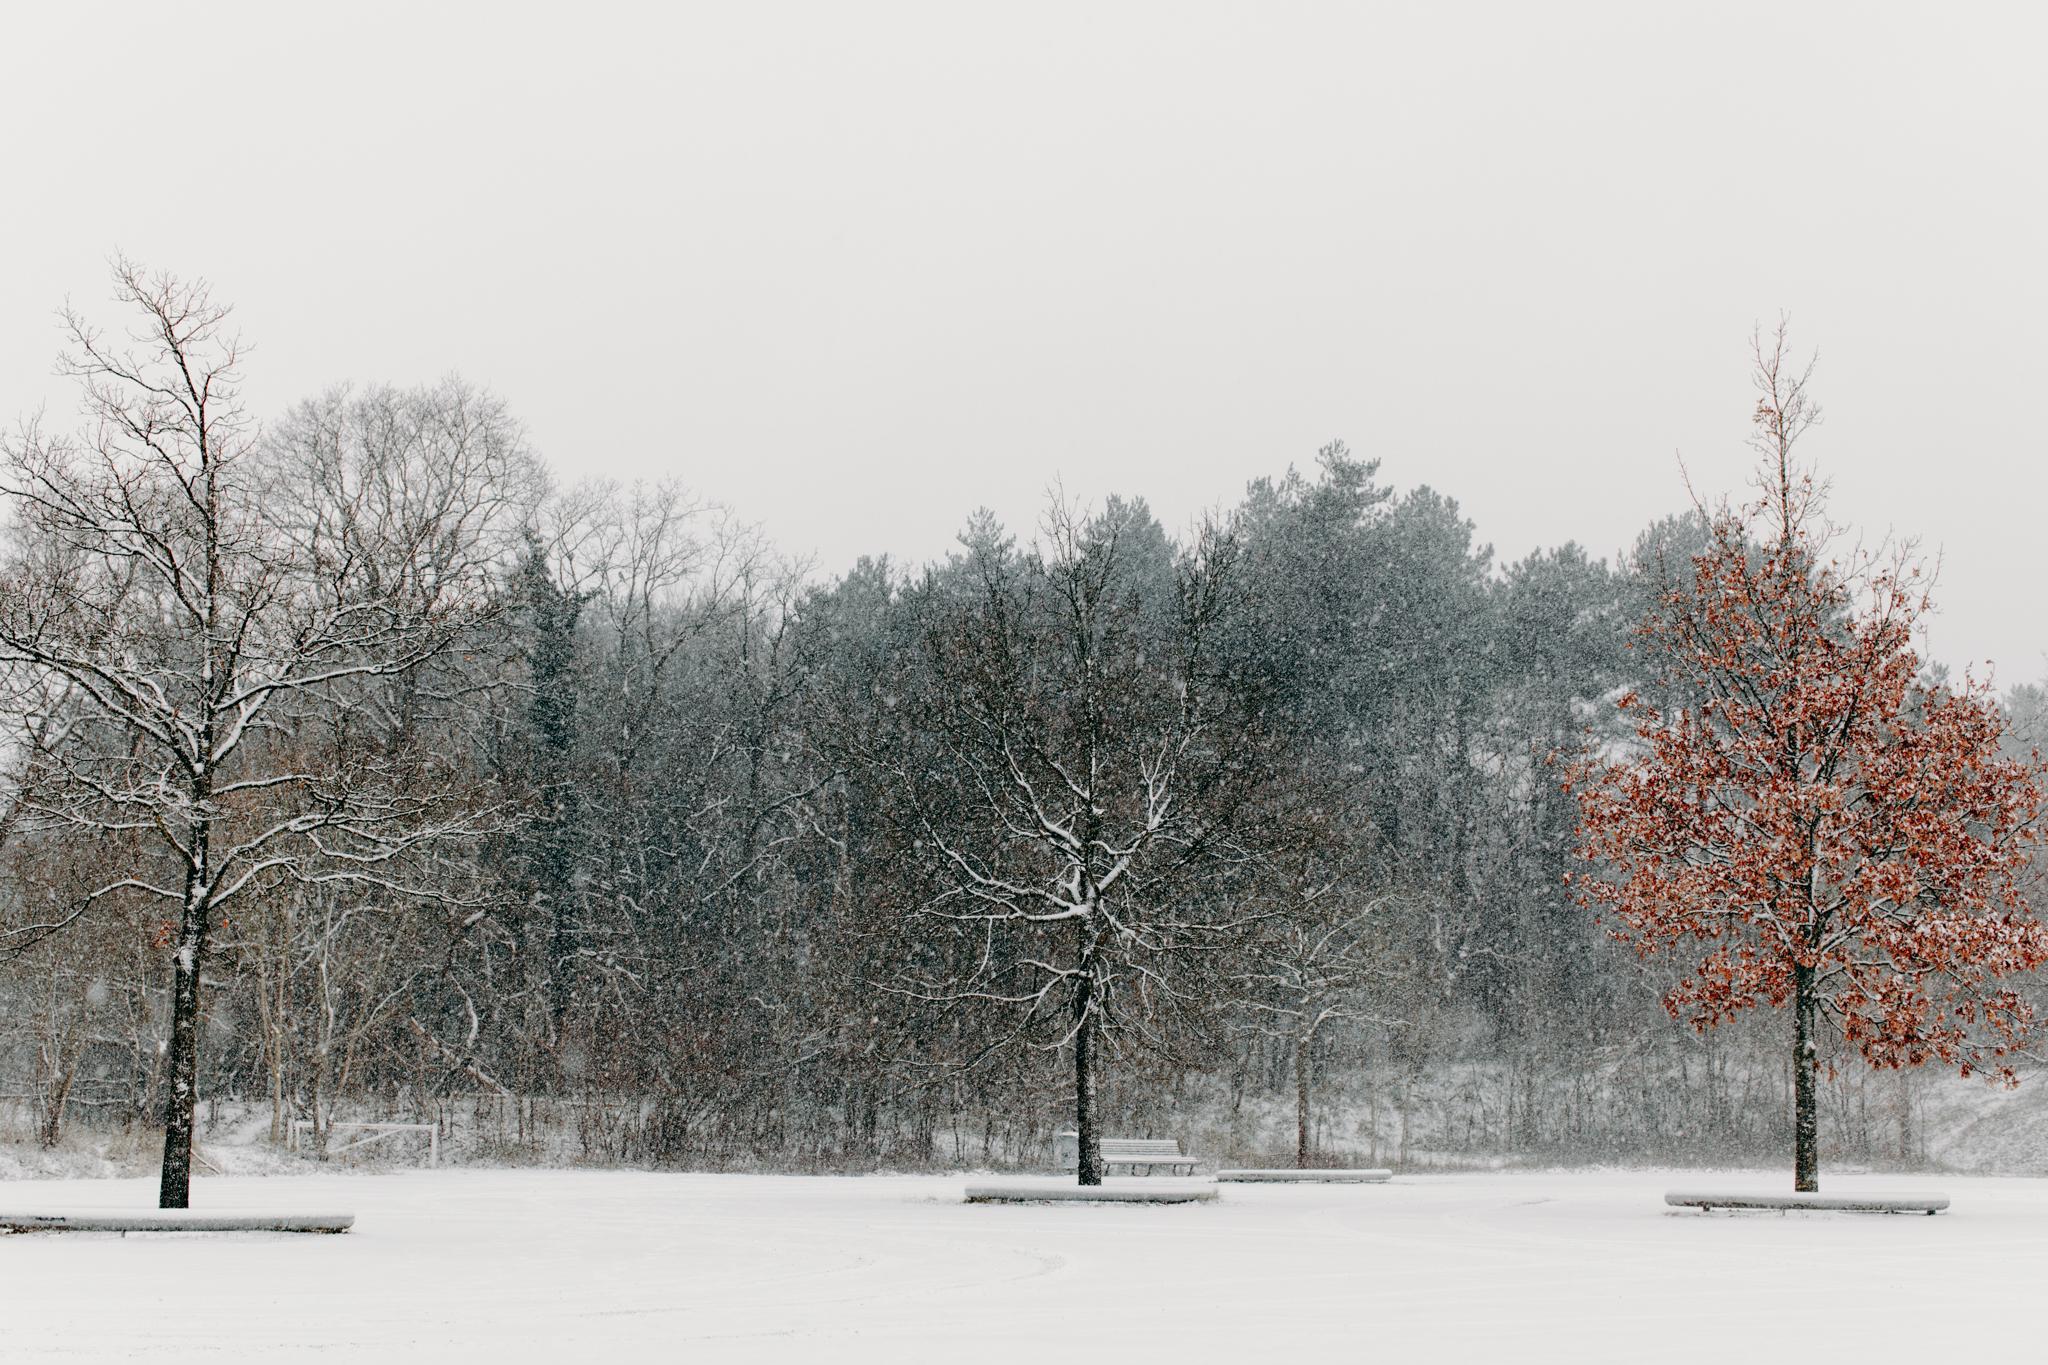 005-winter-sneeuw-oosterplas-bloemendaal.jpg